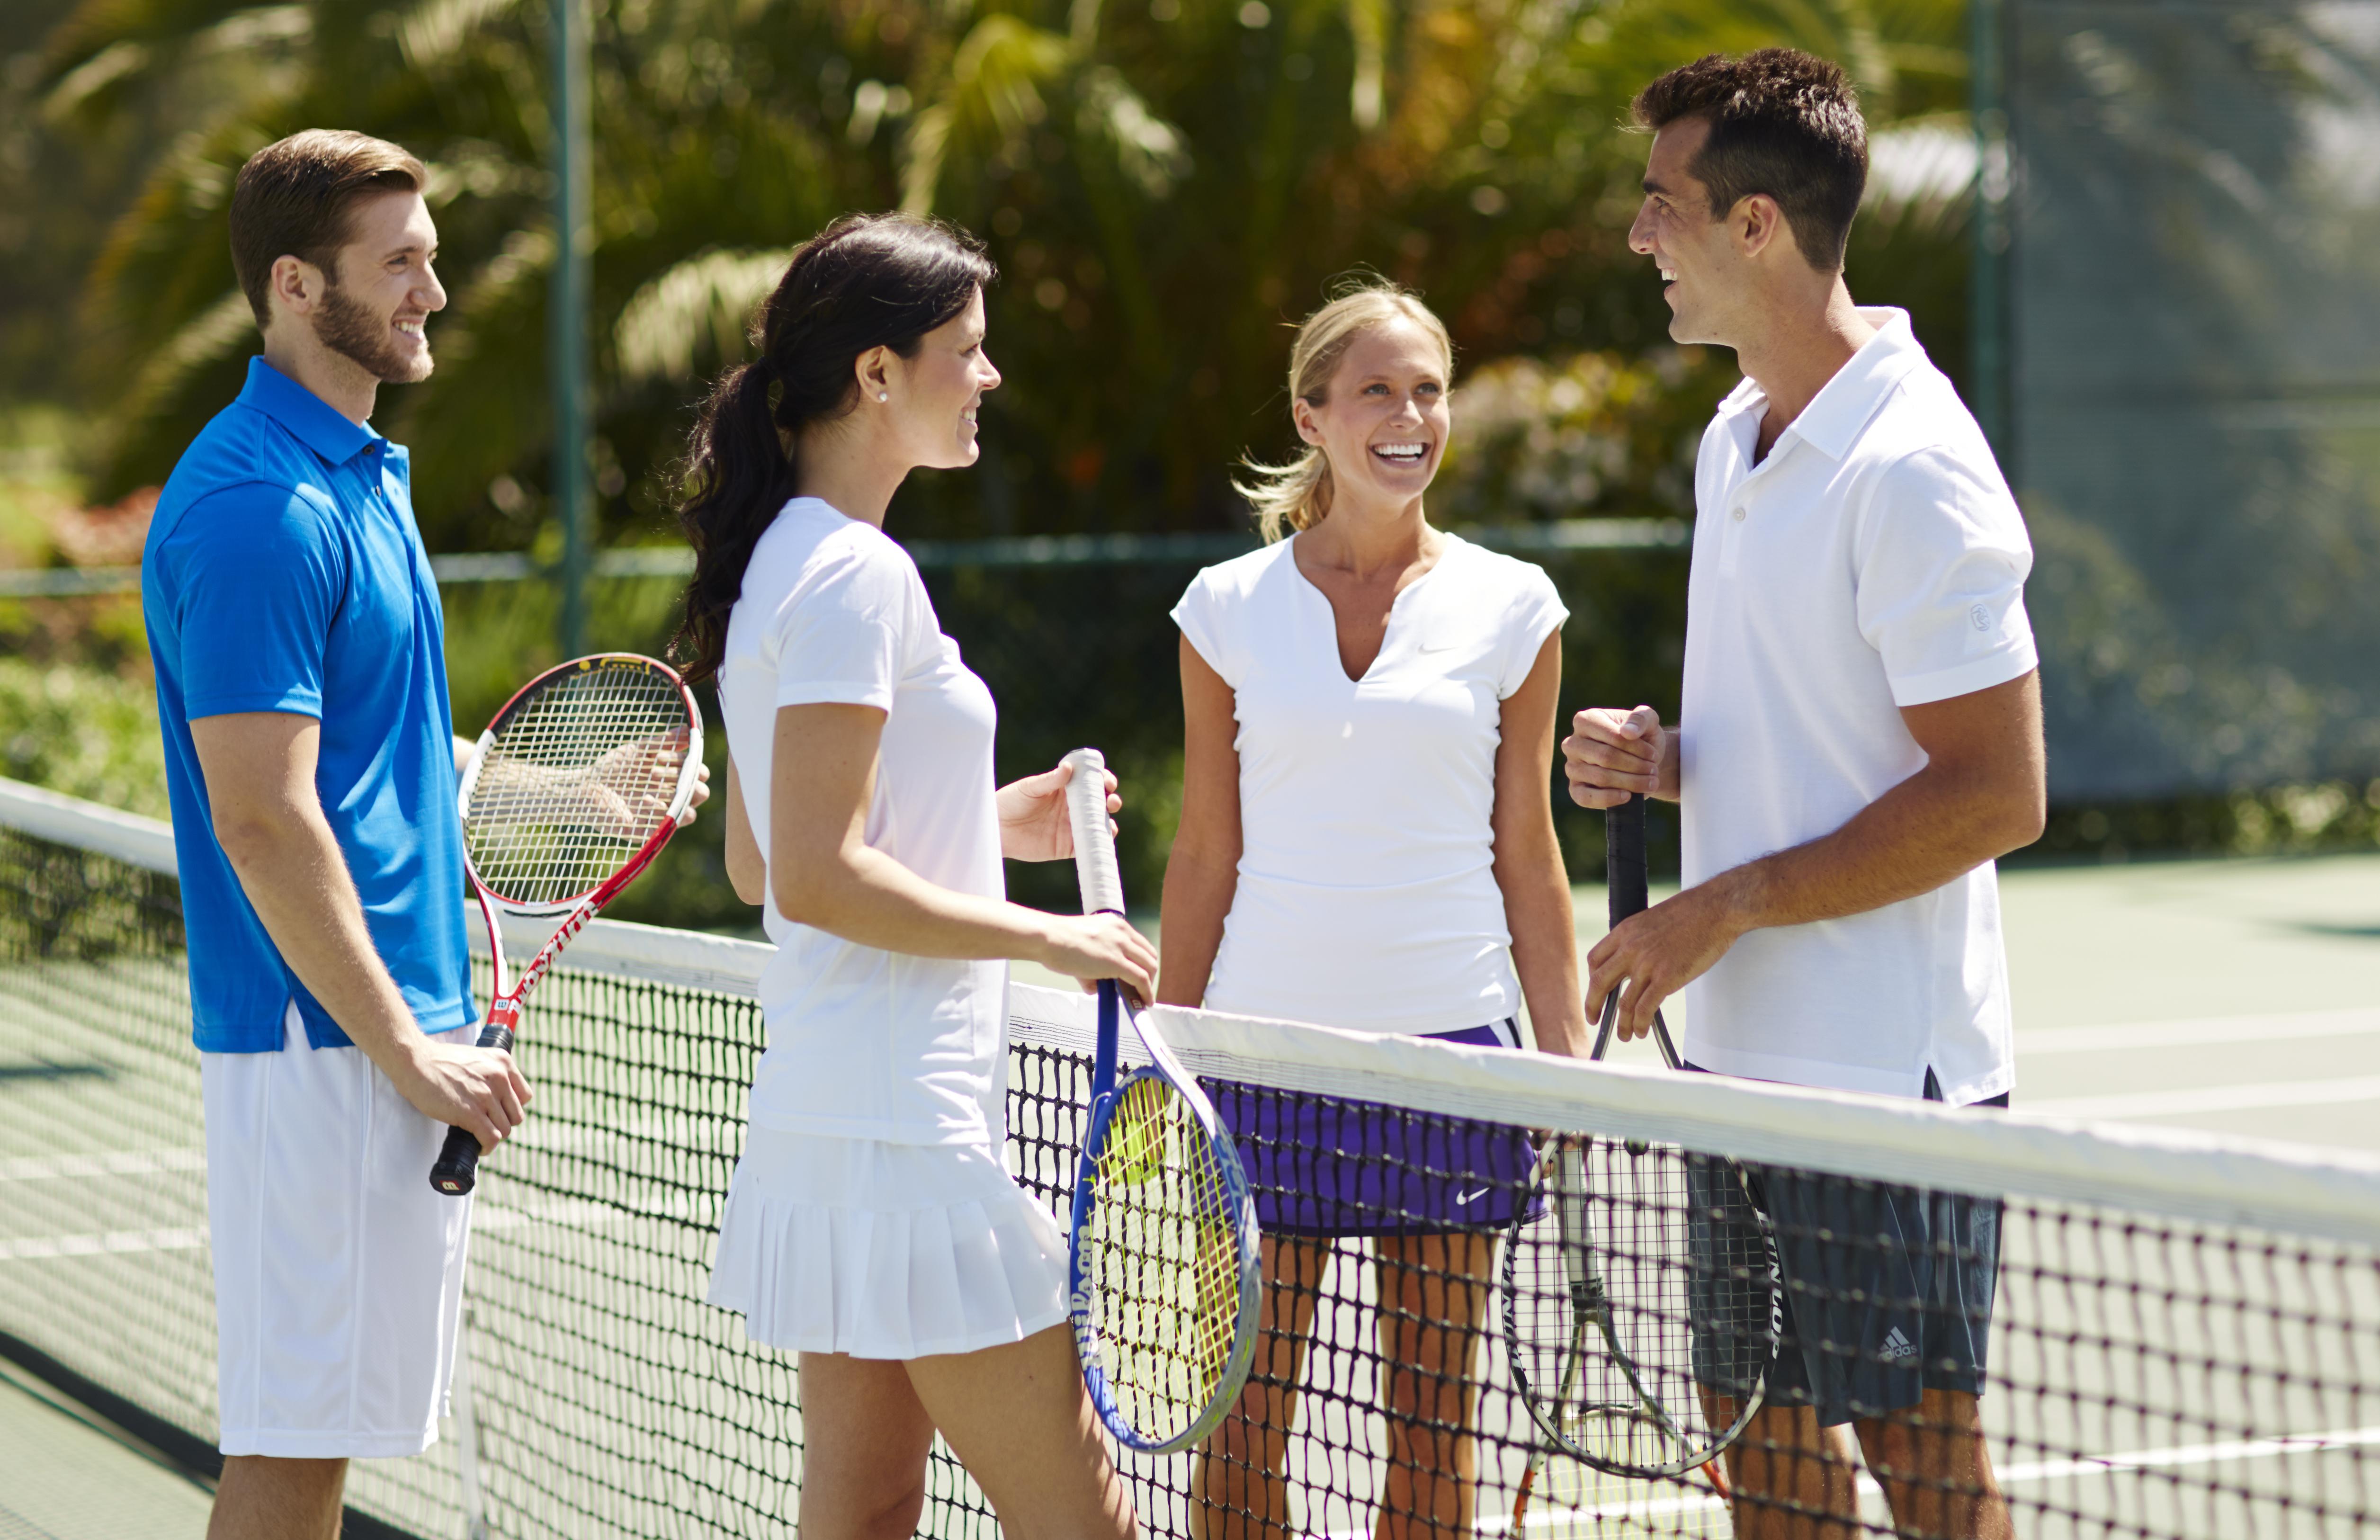 hyatt_hbm_park_sanpa_03_SANPA_P260_Tennis_Lifestyle_66296